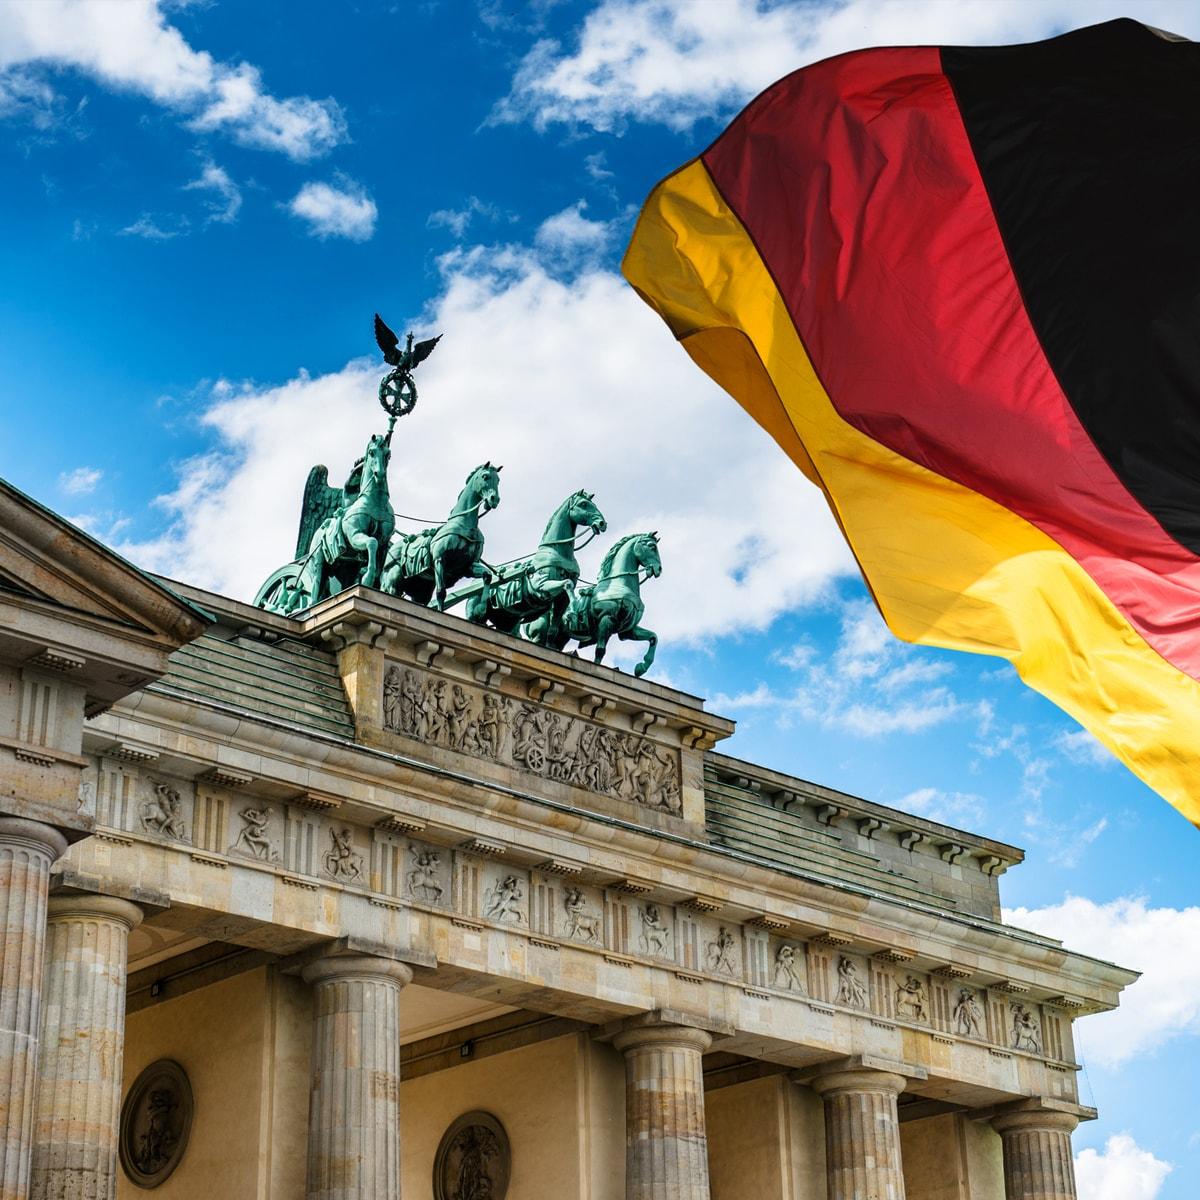 Sale l'indice IFO tedesco a dicembre 2020